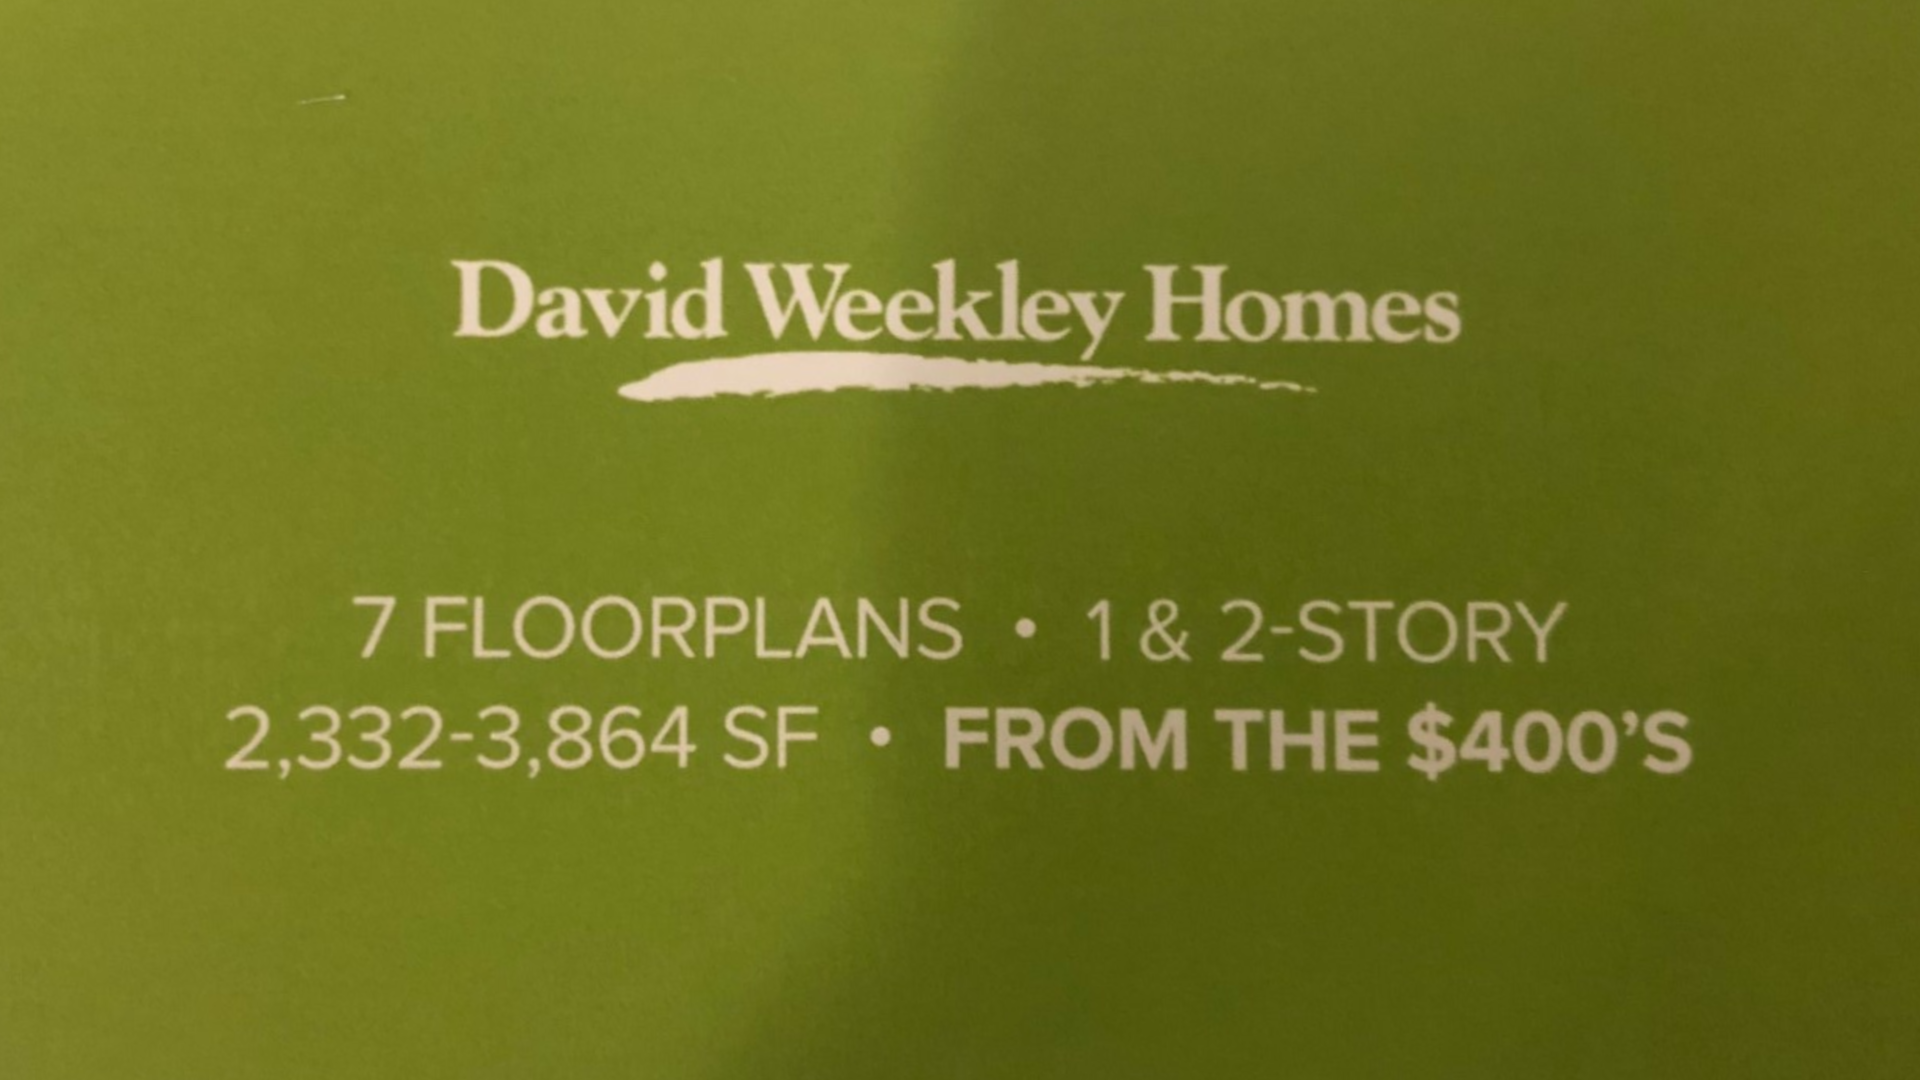 David Weekley Homes for sale at Union Park Norterra